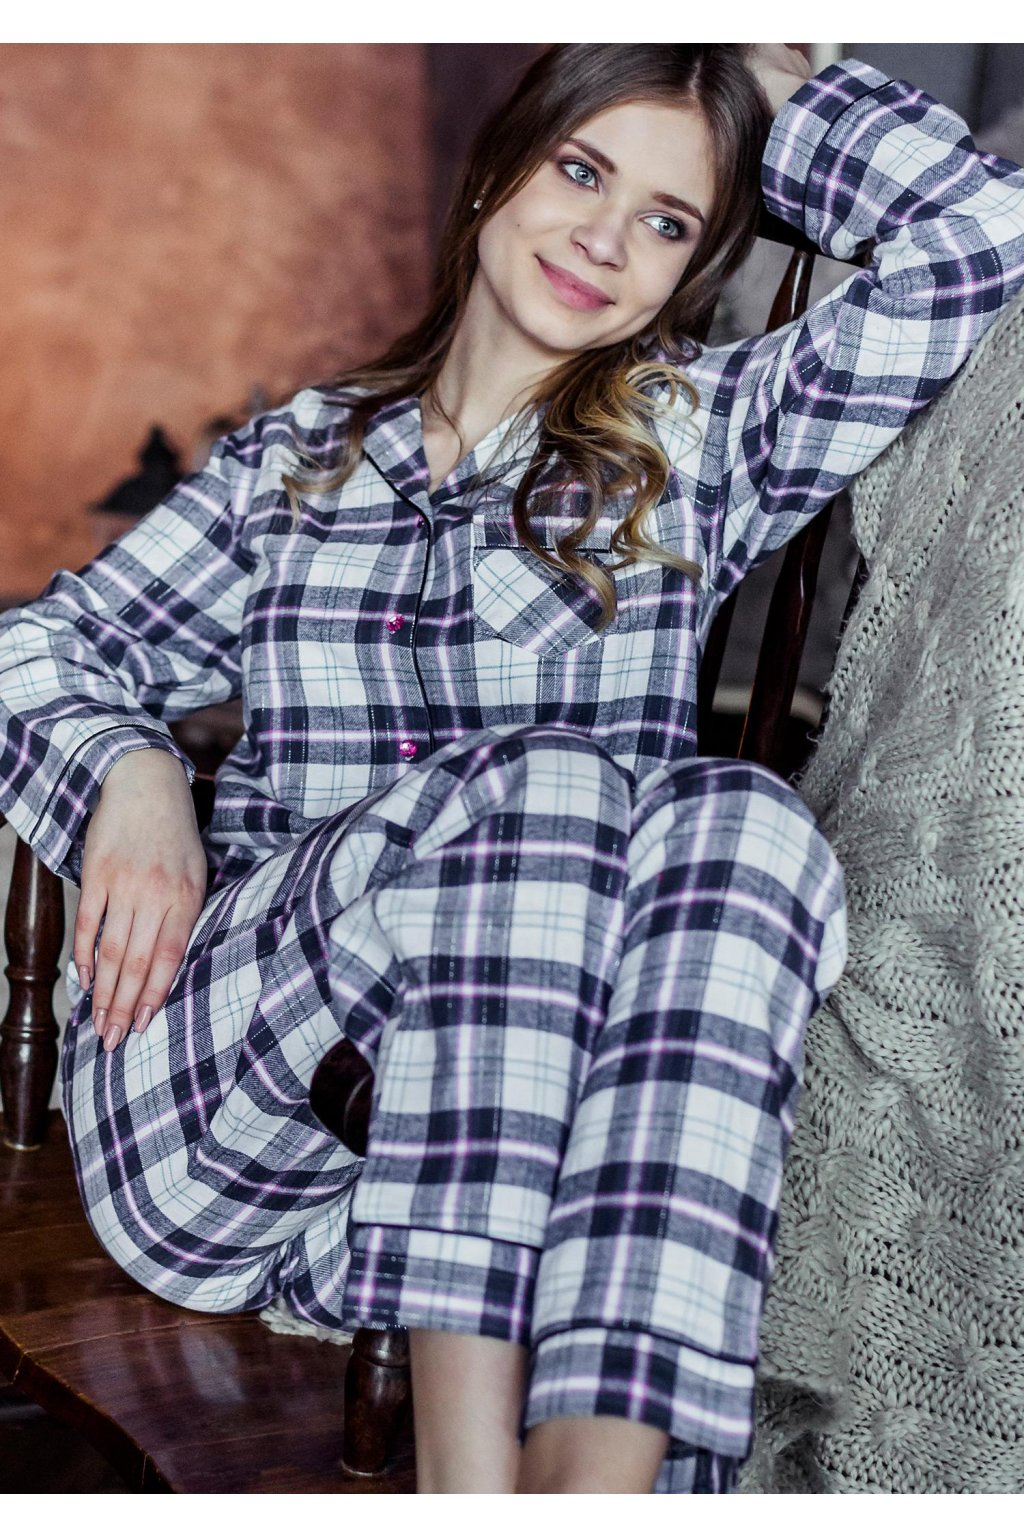 Dámské flanelové kárované pyžamo LNS 417 KEY